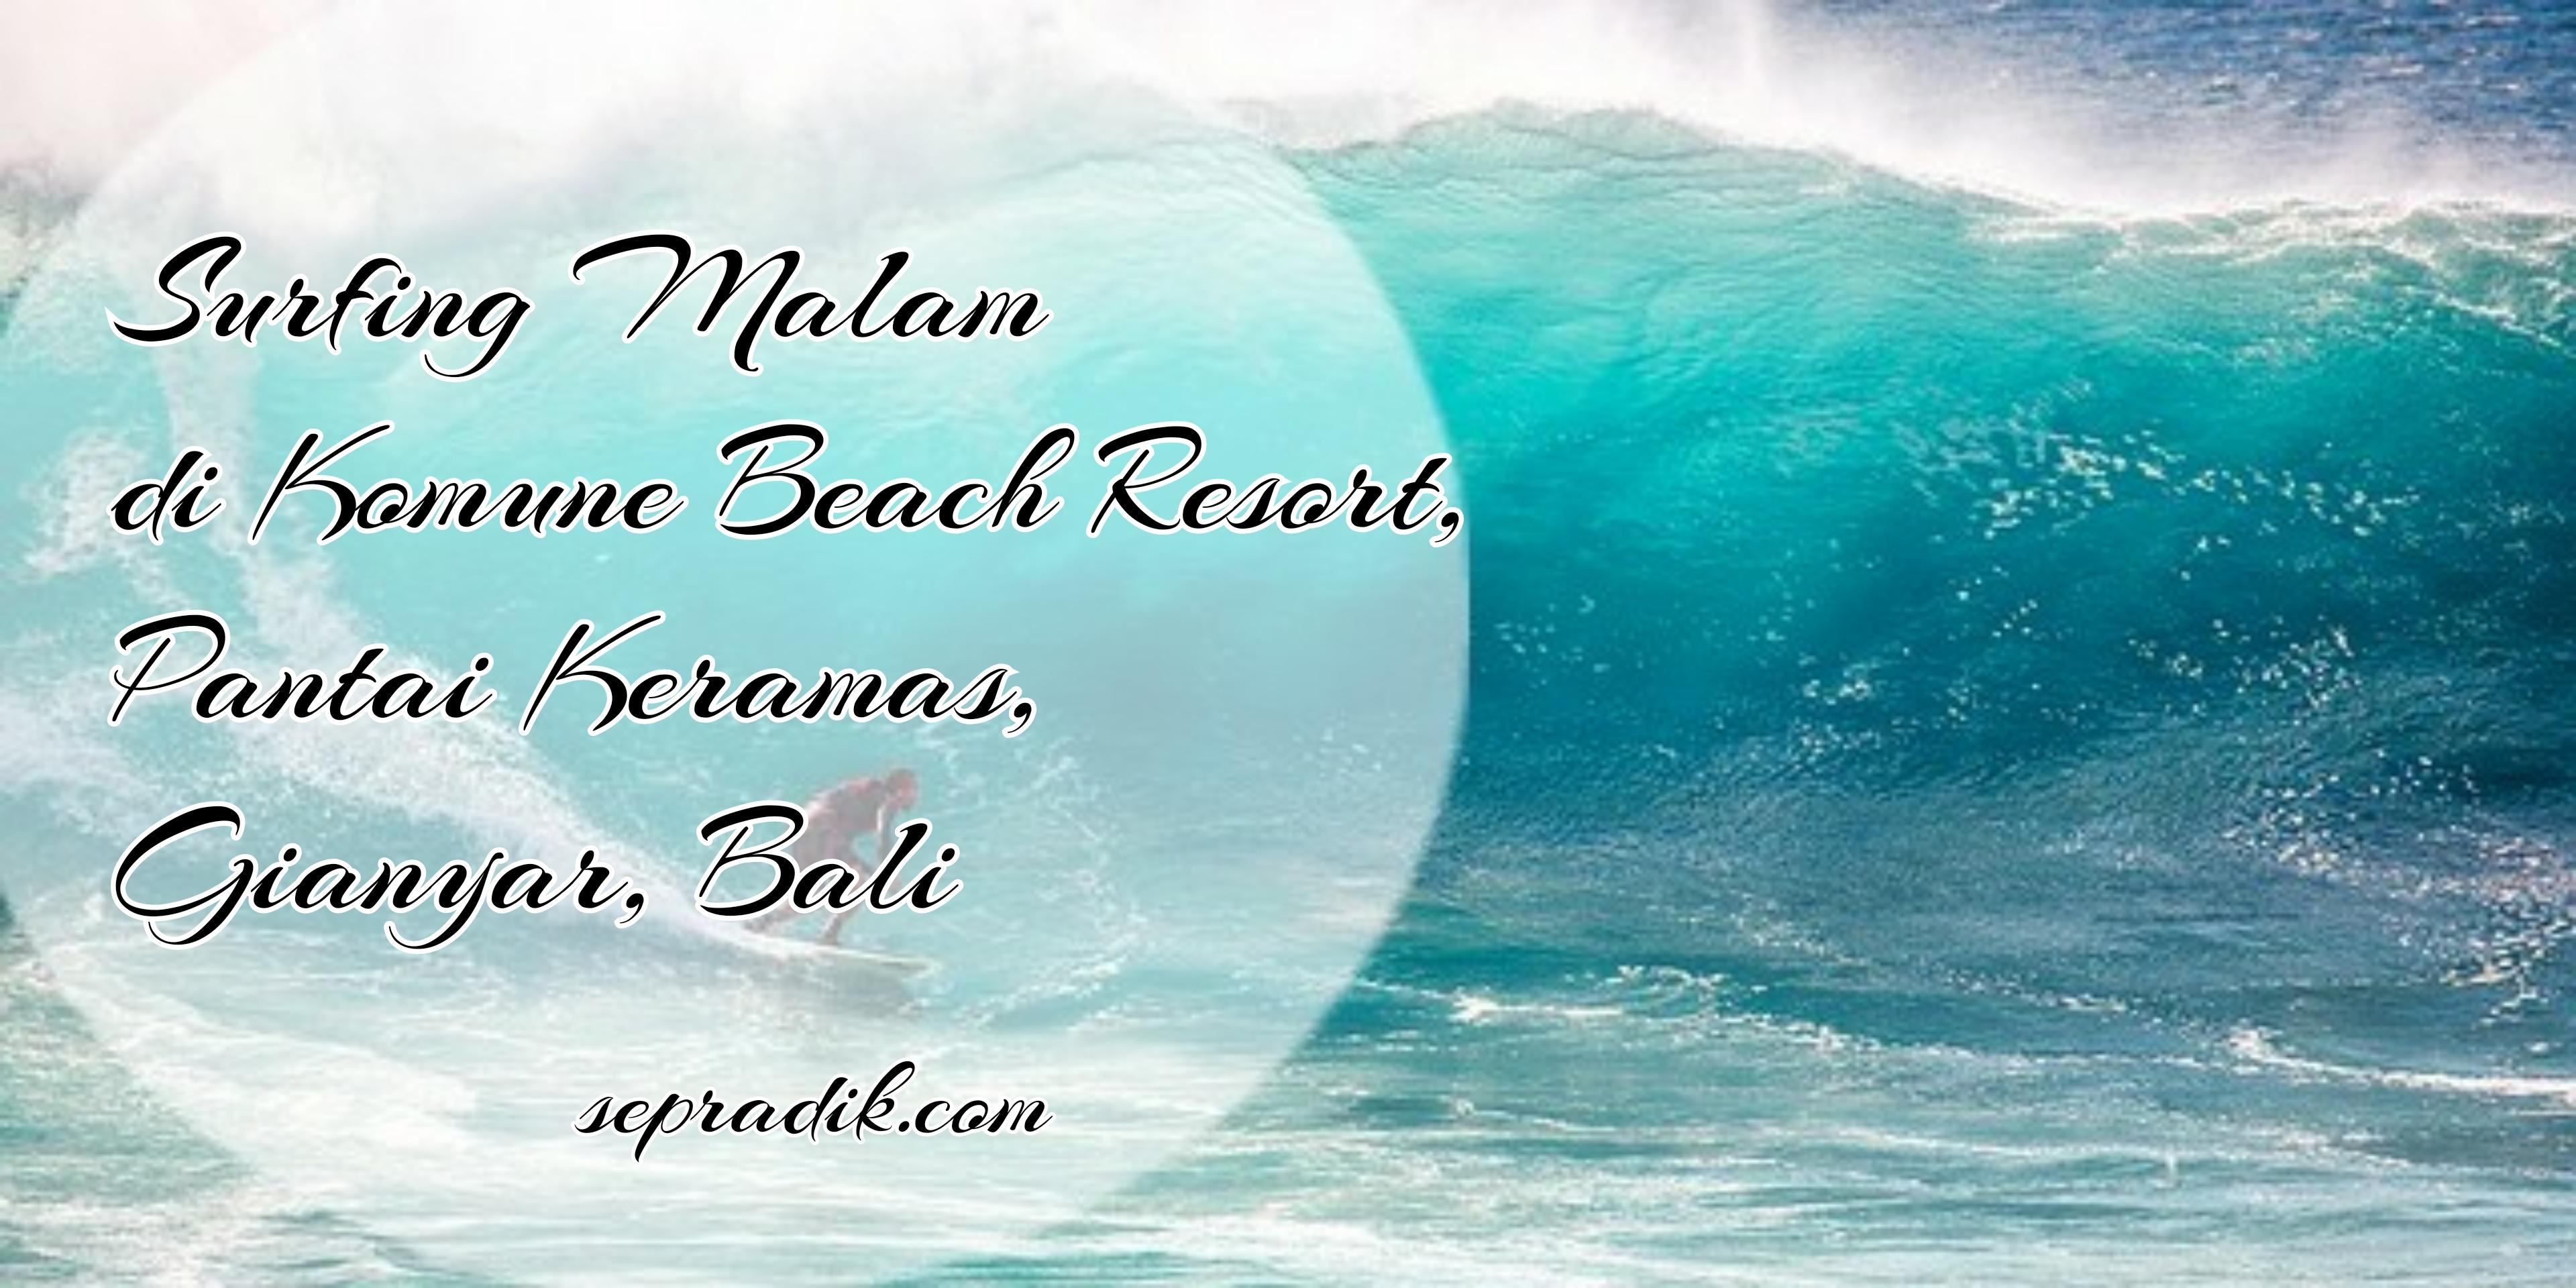 Komune Beach Resort, Pantai Keramas, Gianyar Bali